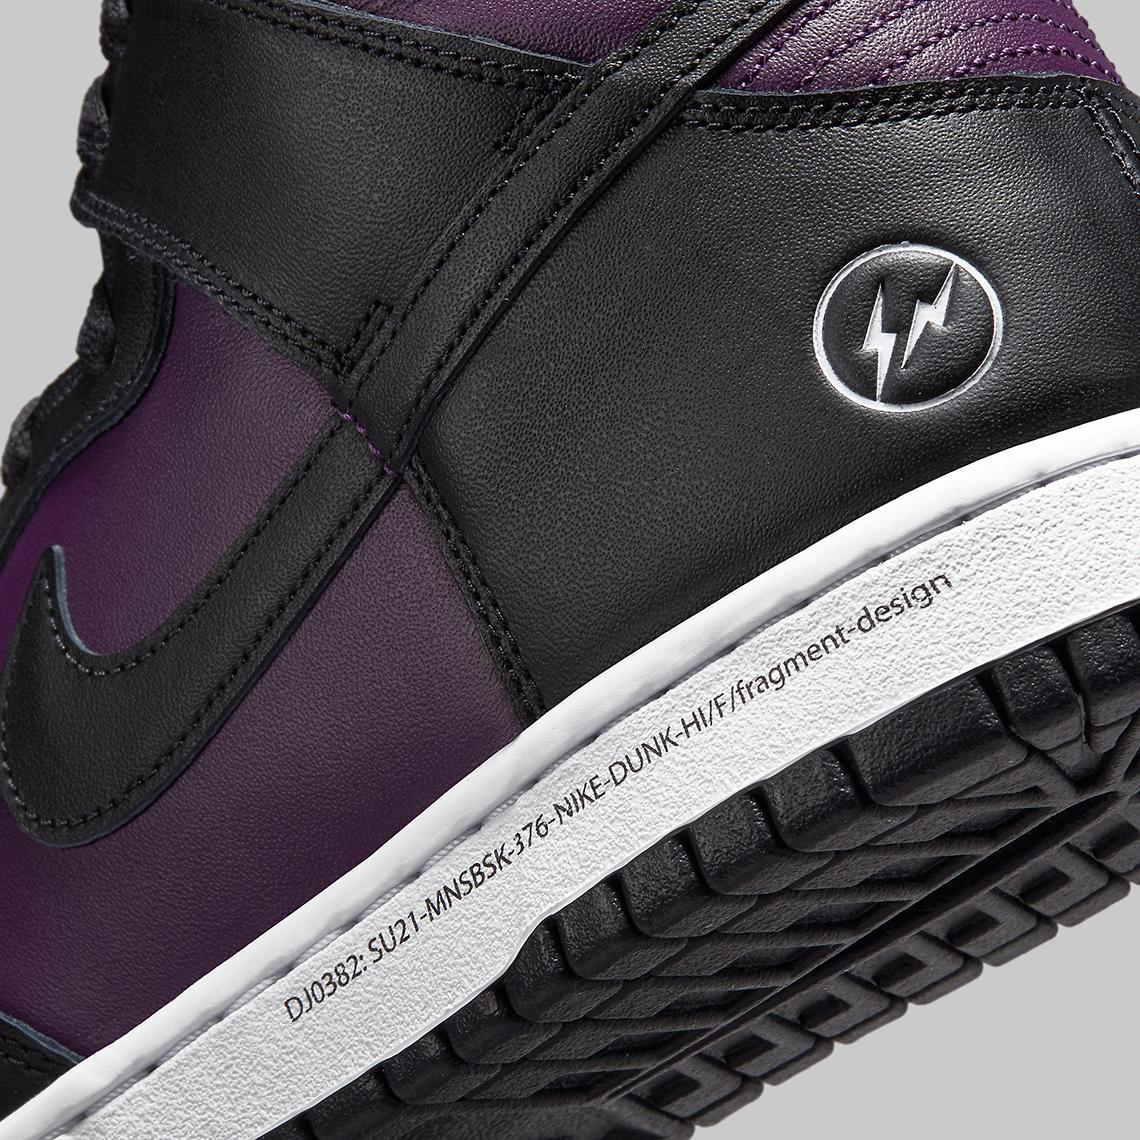 fragment-Nike-Dunk-High-Beijing-2021-DJ0382-600-2.jpg?w=1140